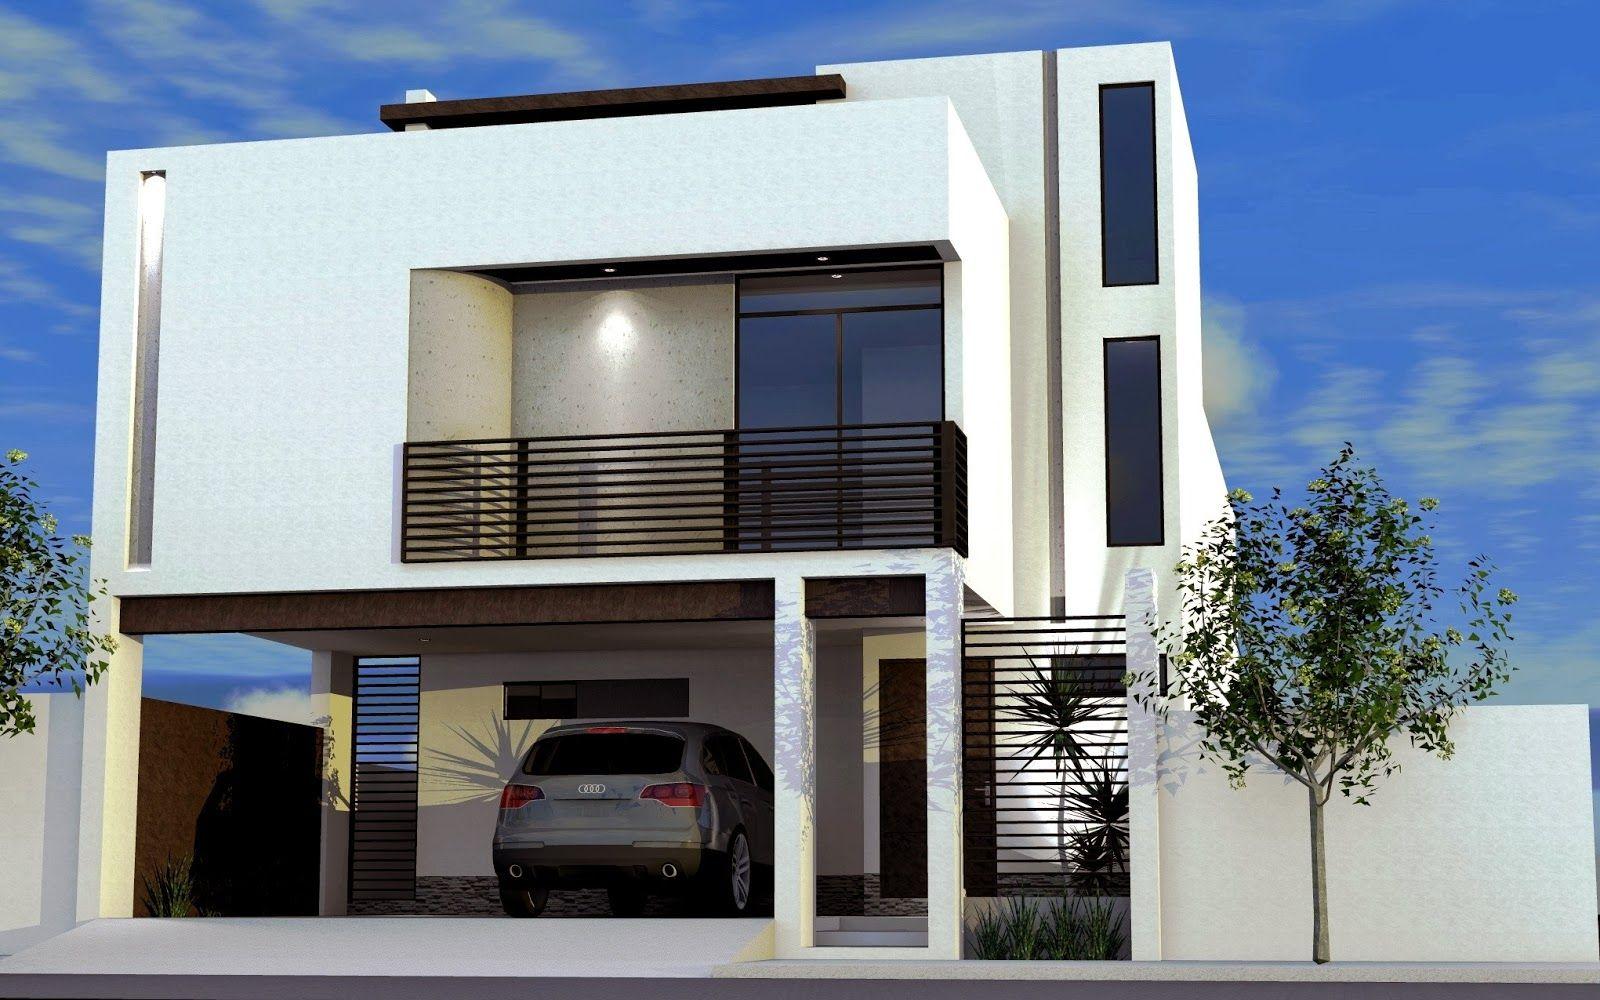 Fachada de casa contempor nea moderna lujosa y elegante for Cama lujosa